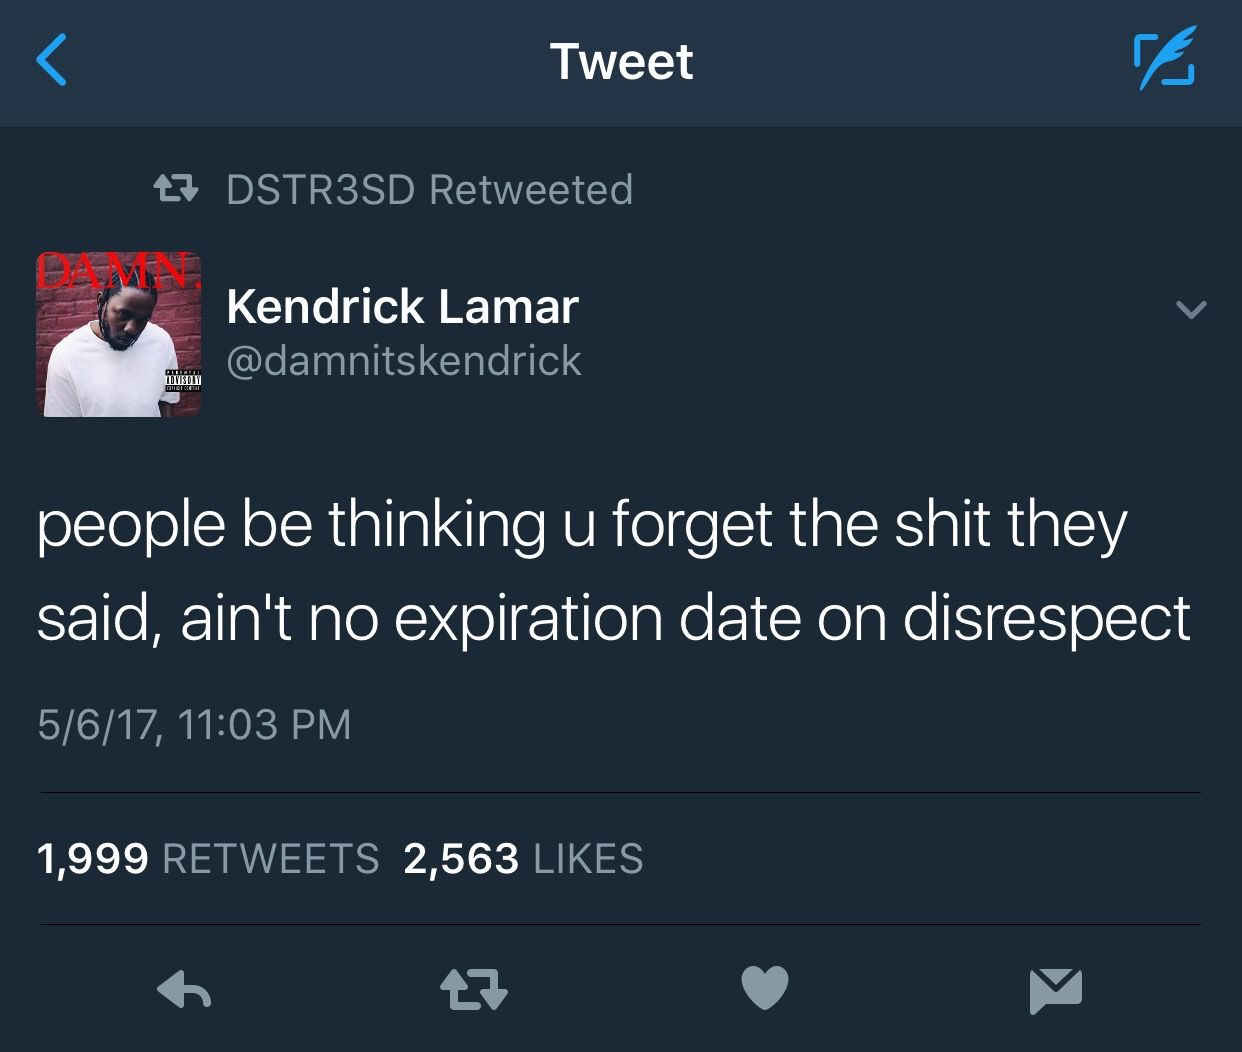 Kendrick lamar 420 dating